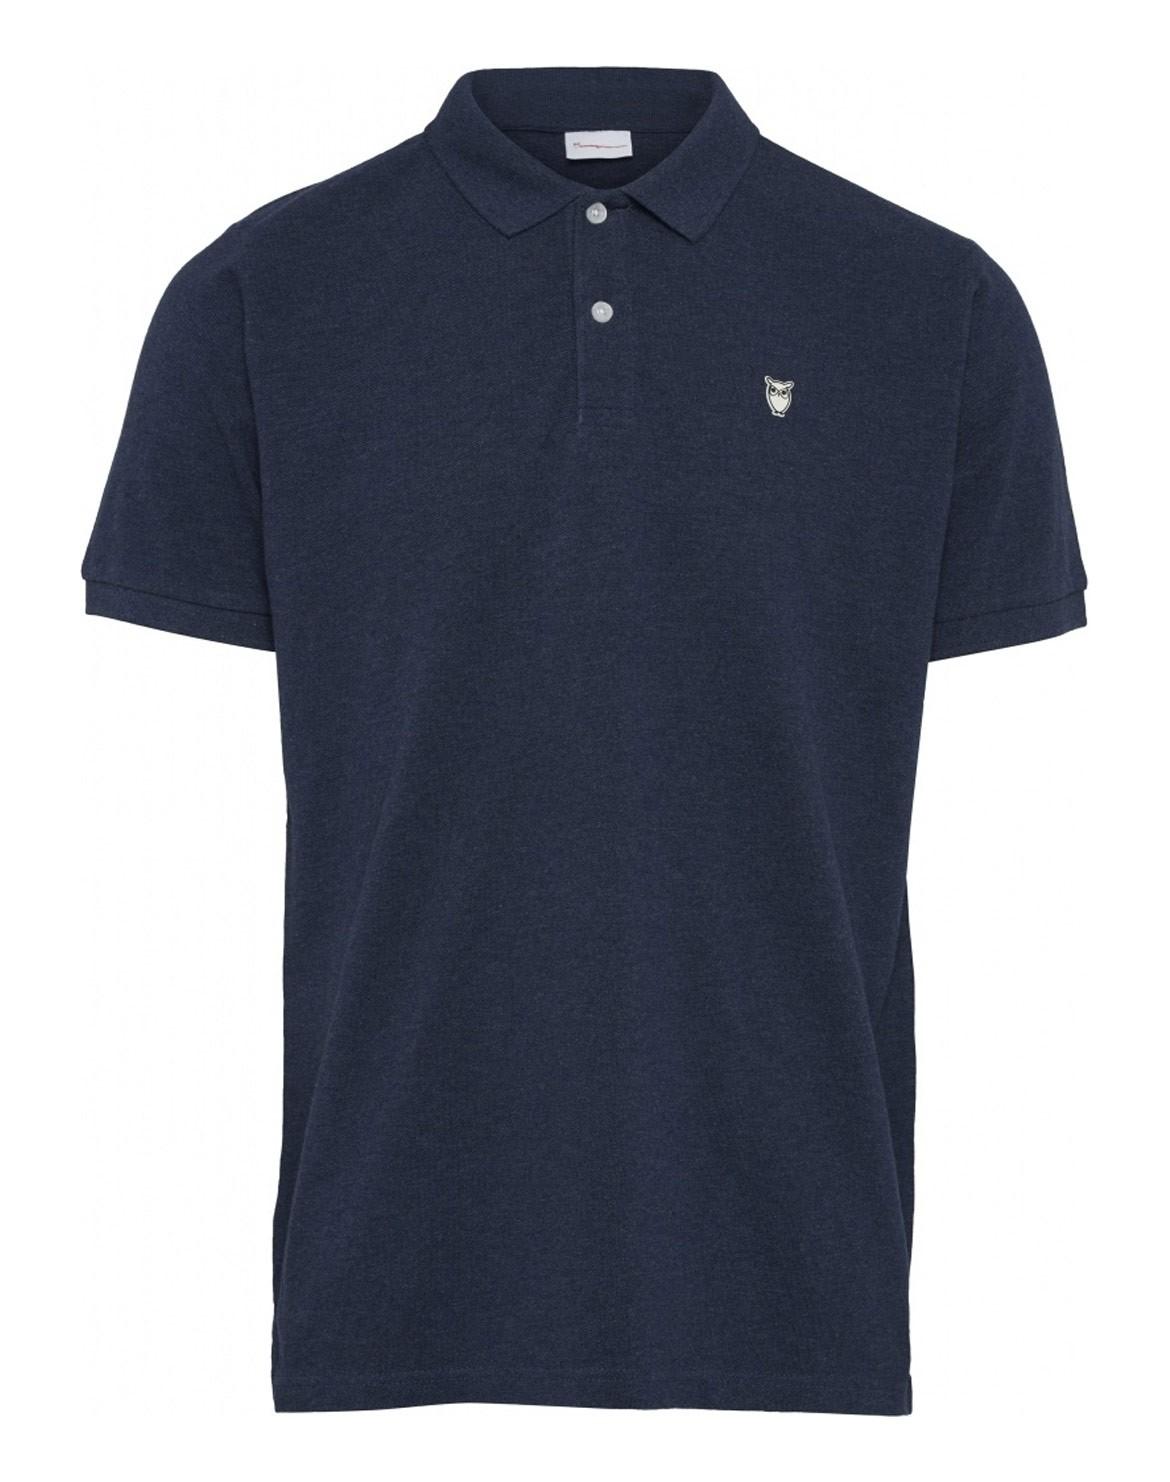 Rowan Poloshirt